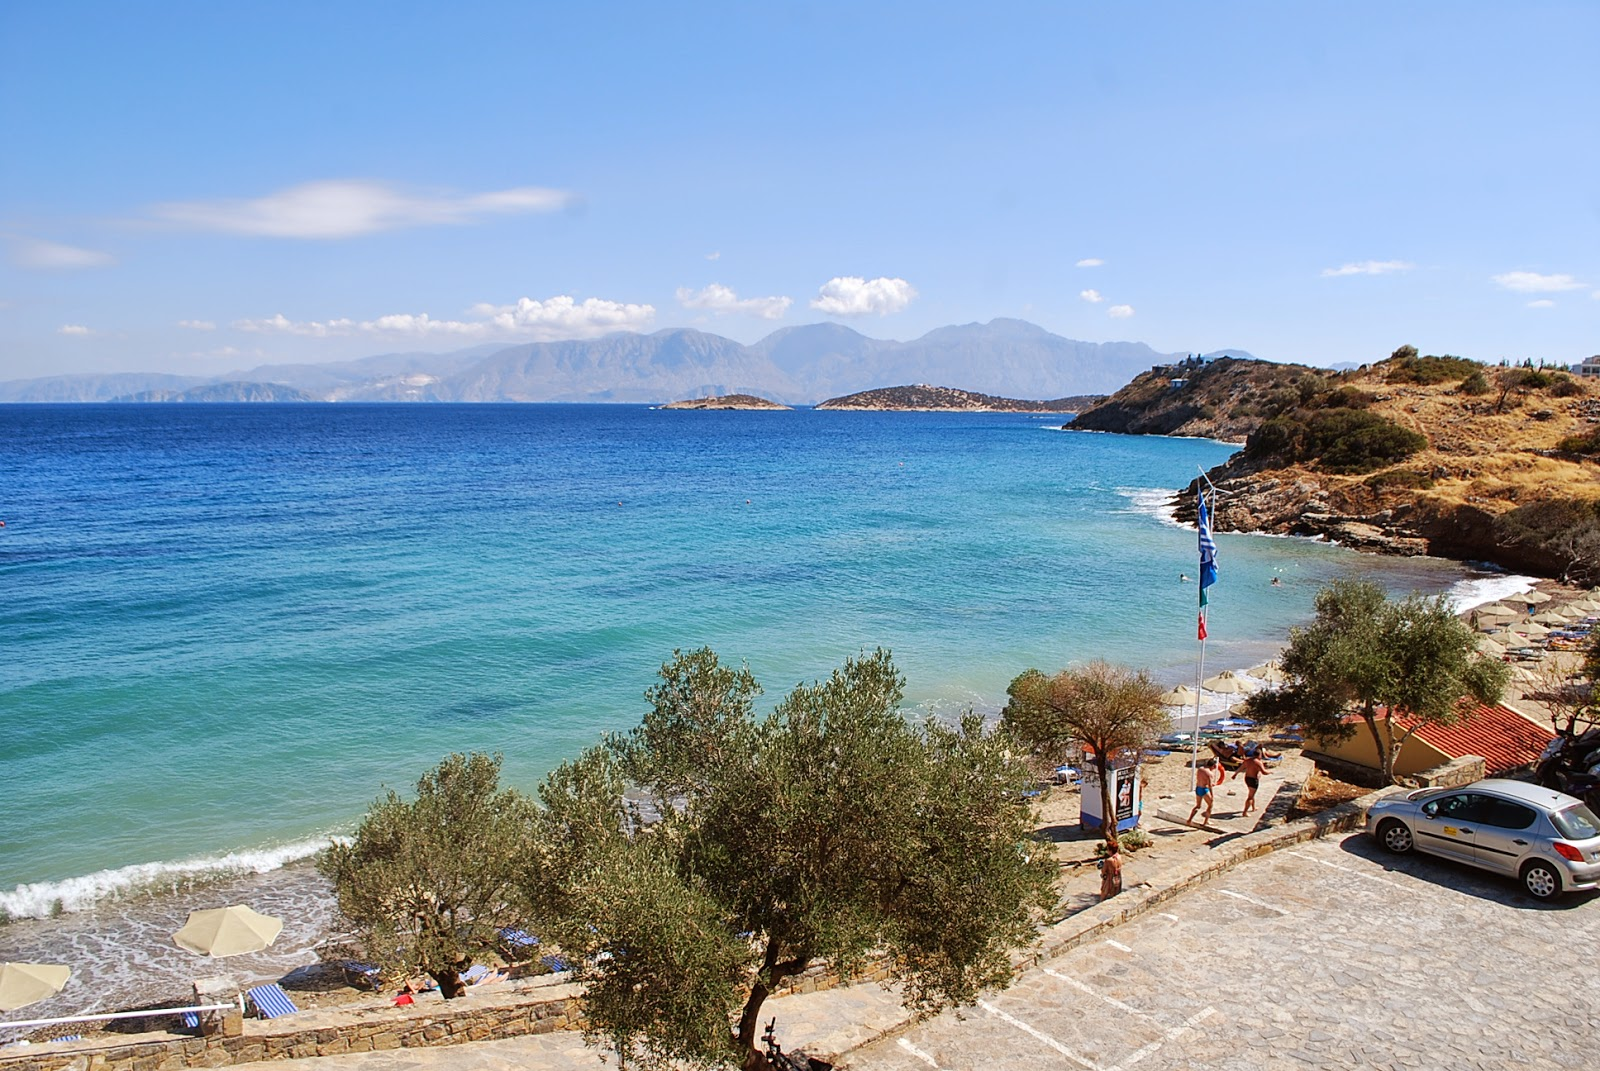 Пляж Гавания, Крит, Греция. Havania beach, Crete, Greece.